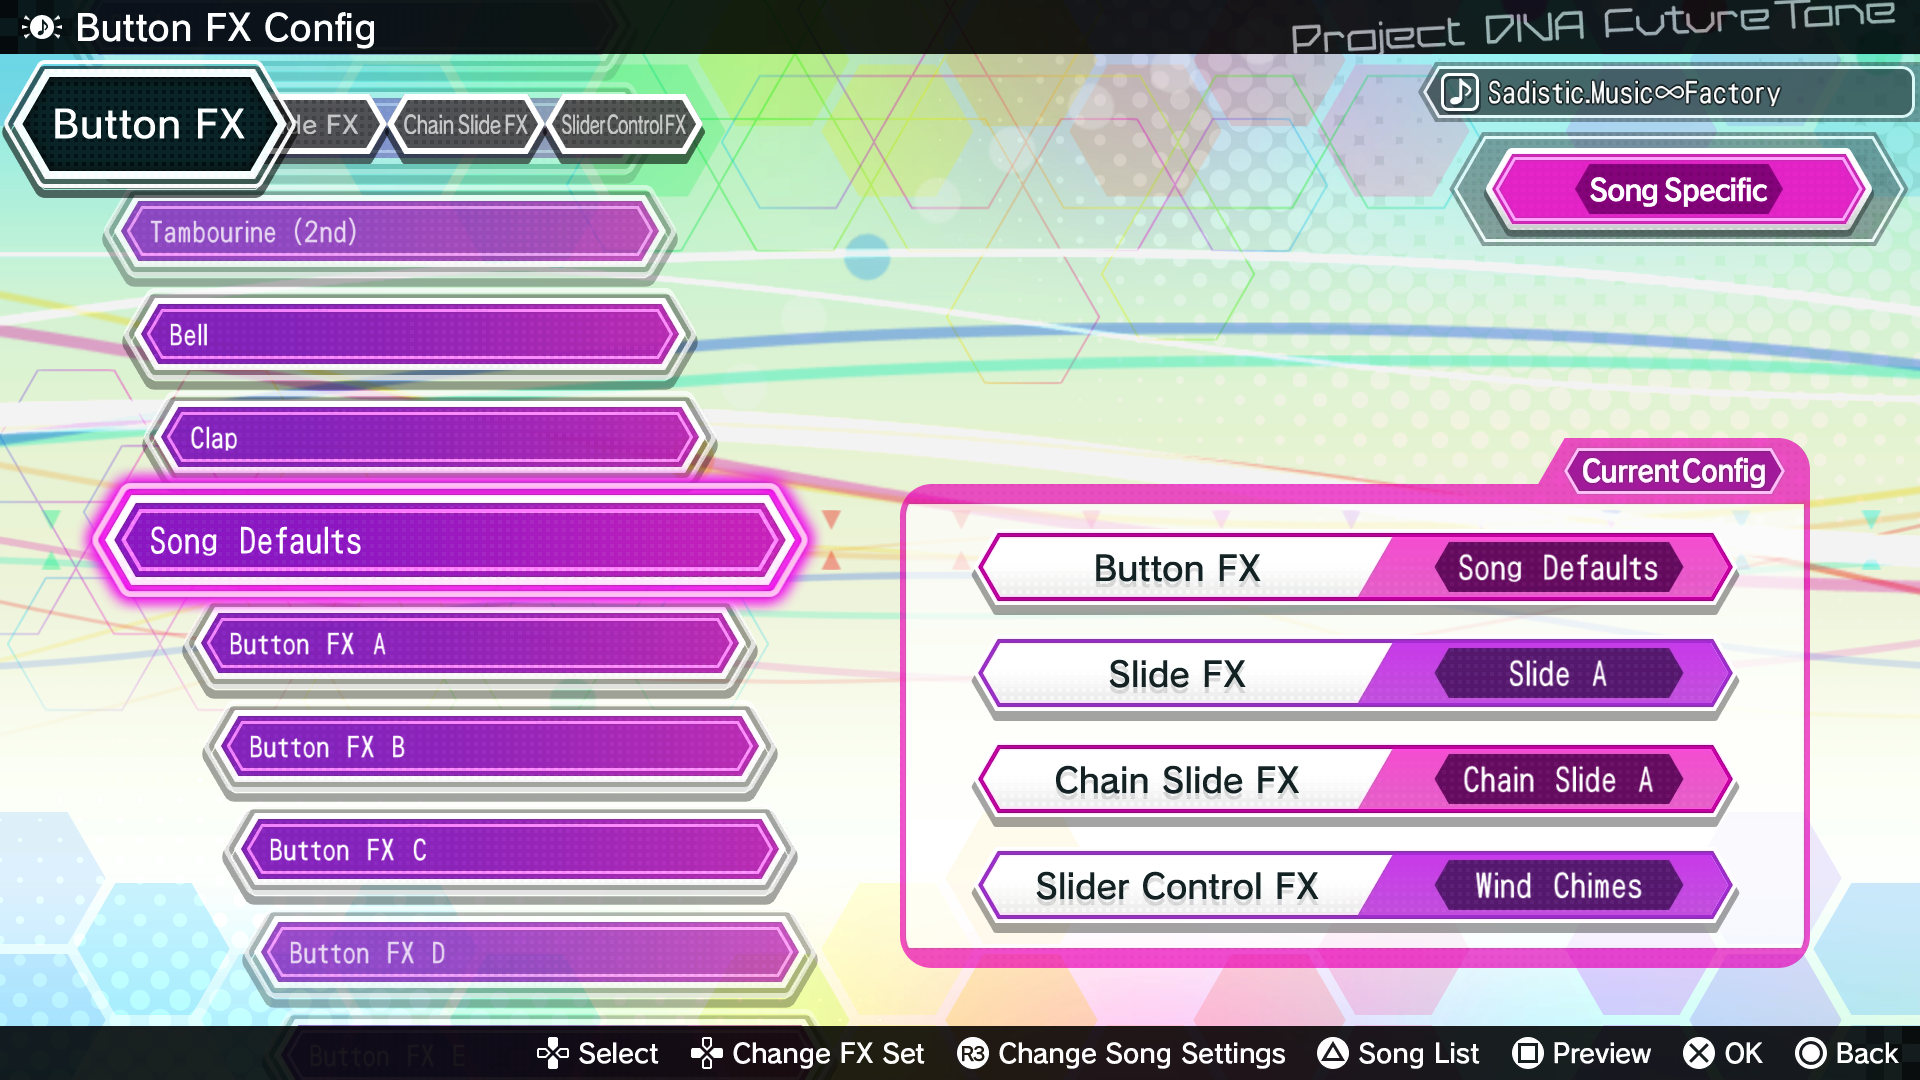 Web Manual - Hatsune Miku: Project DIVA Future Tone